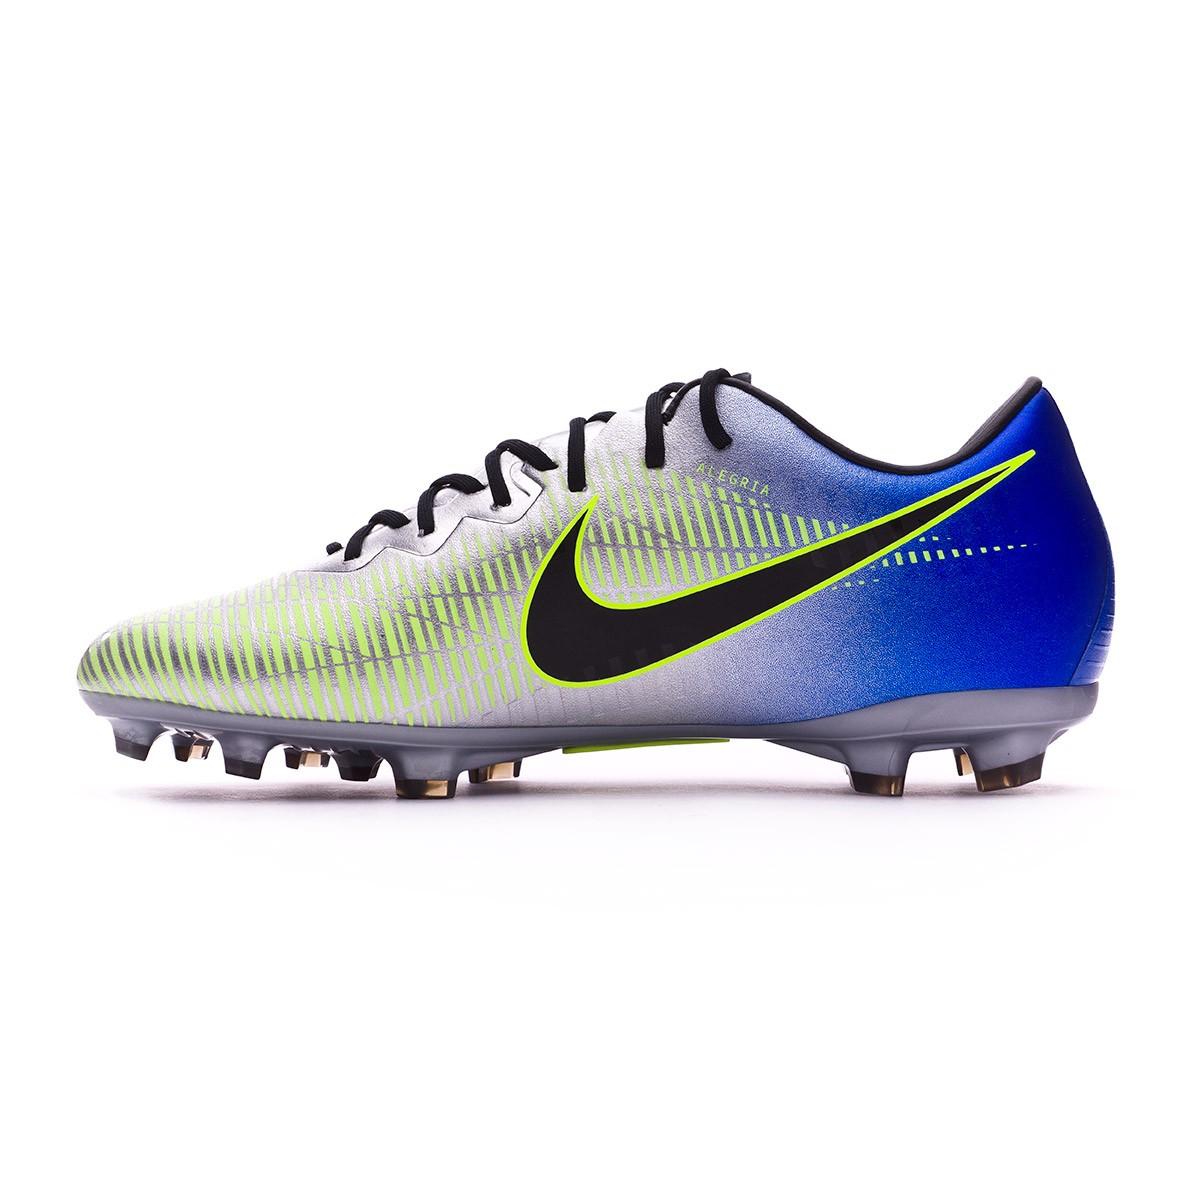 bf01f8d6754c Football Boots Nike Kids Mercurial Vapor XI FG Neymar Racer  blue-Black-Chrome-Volt - Football store Fútbol Emotion